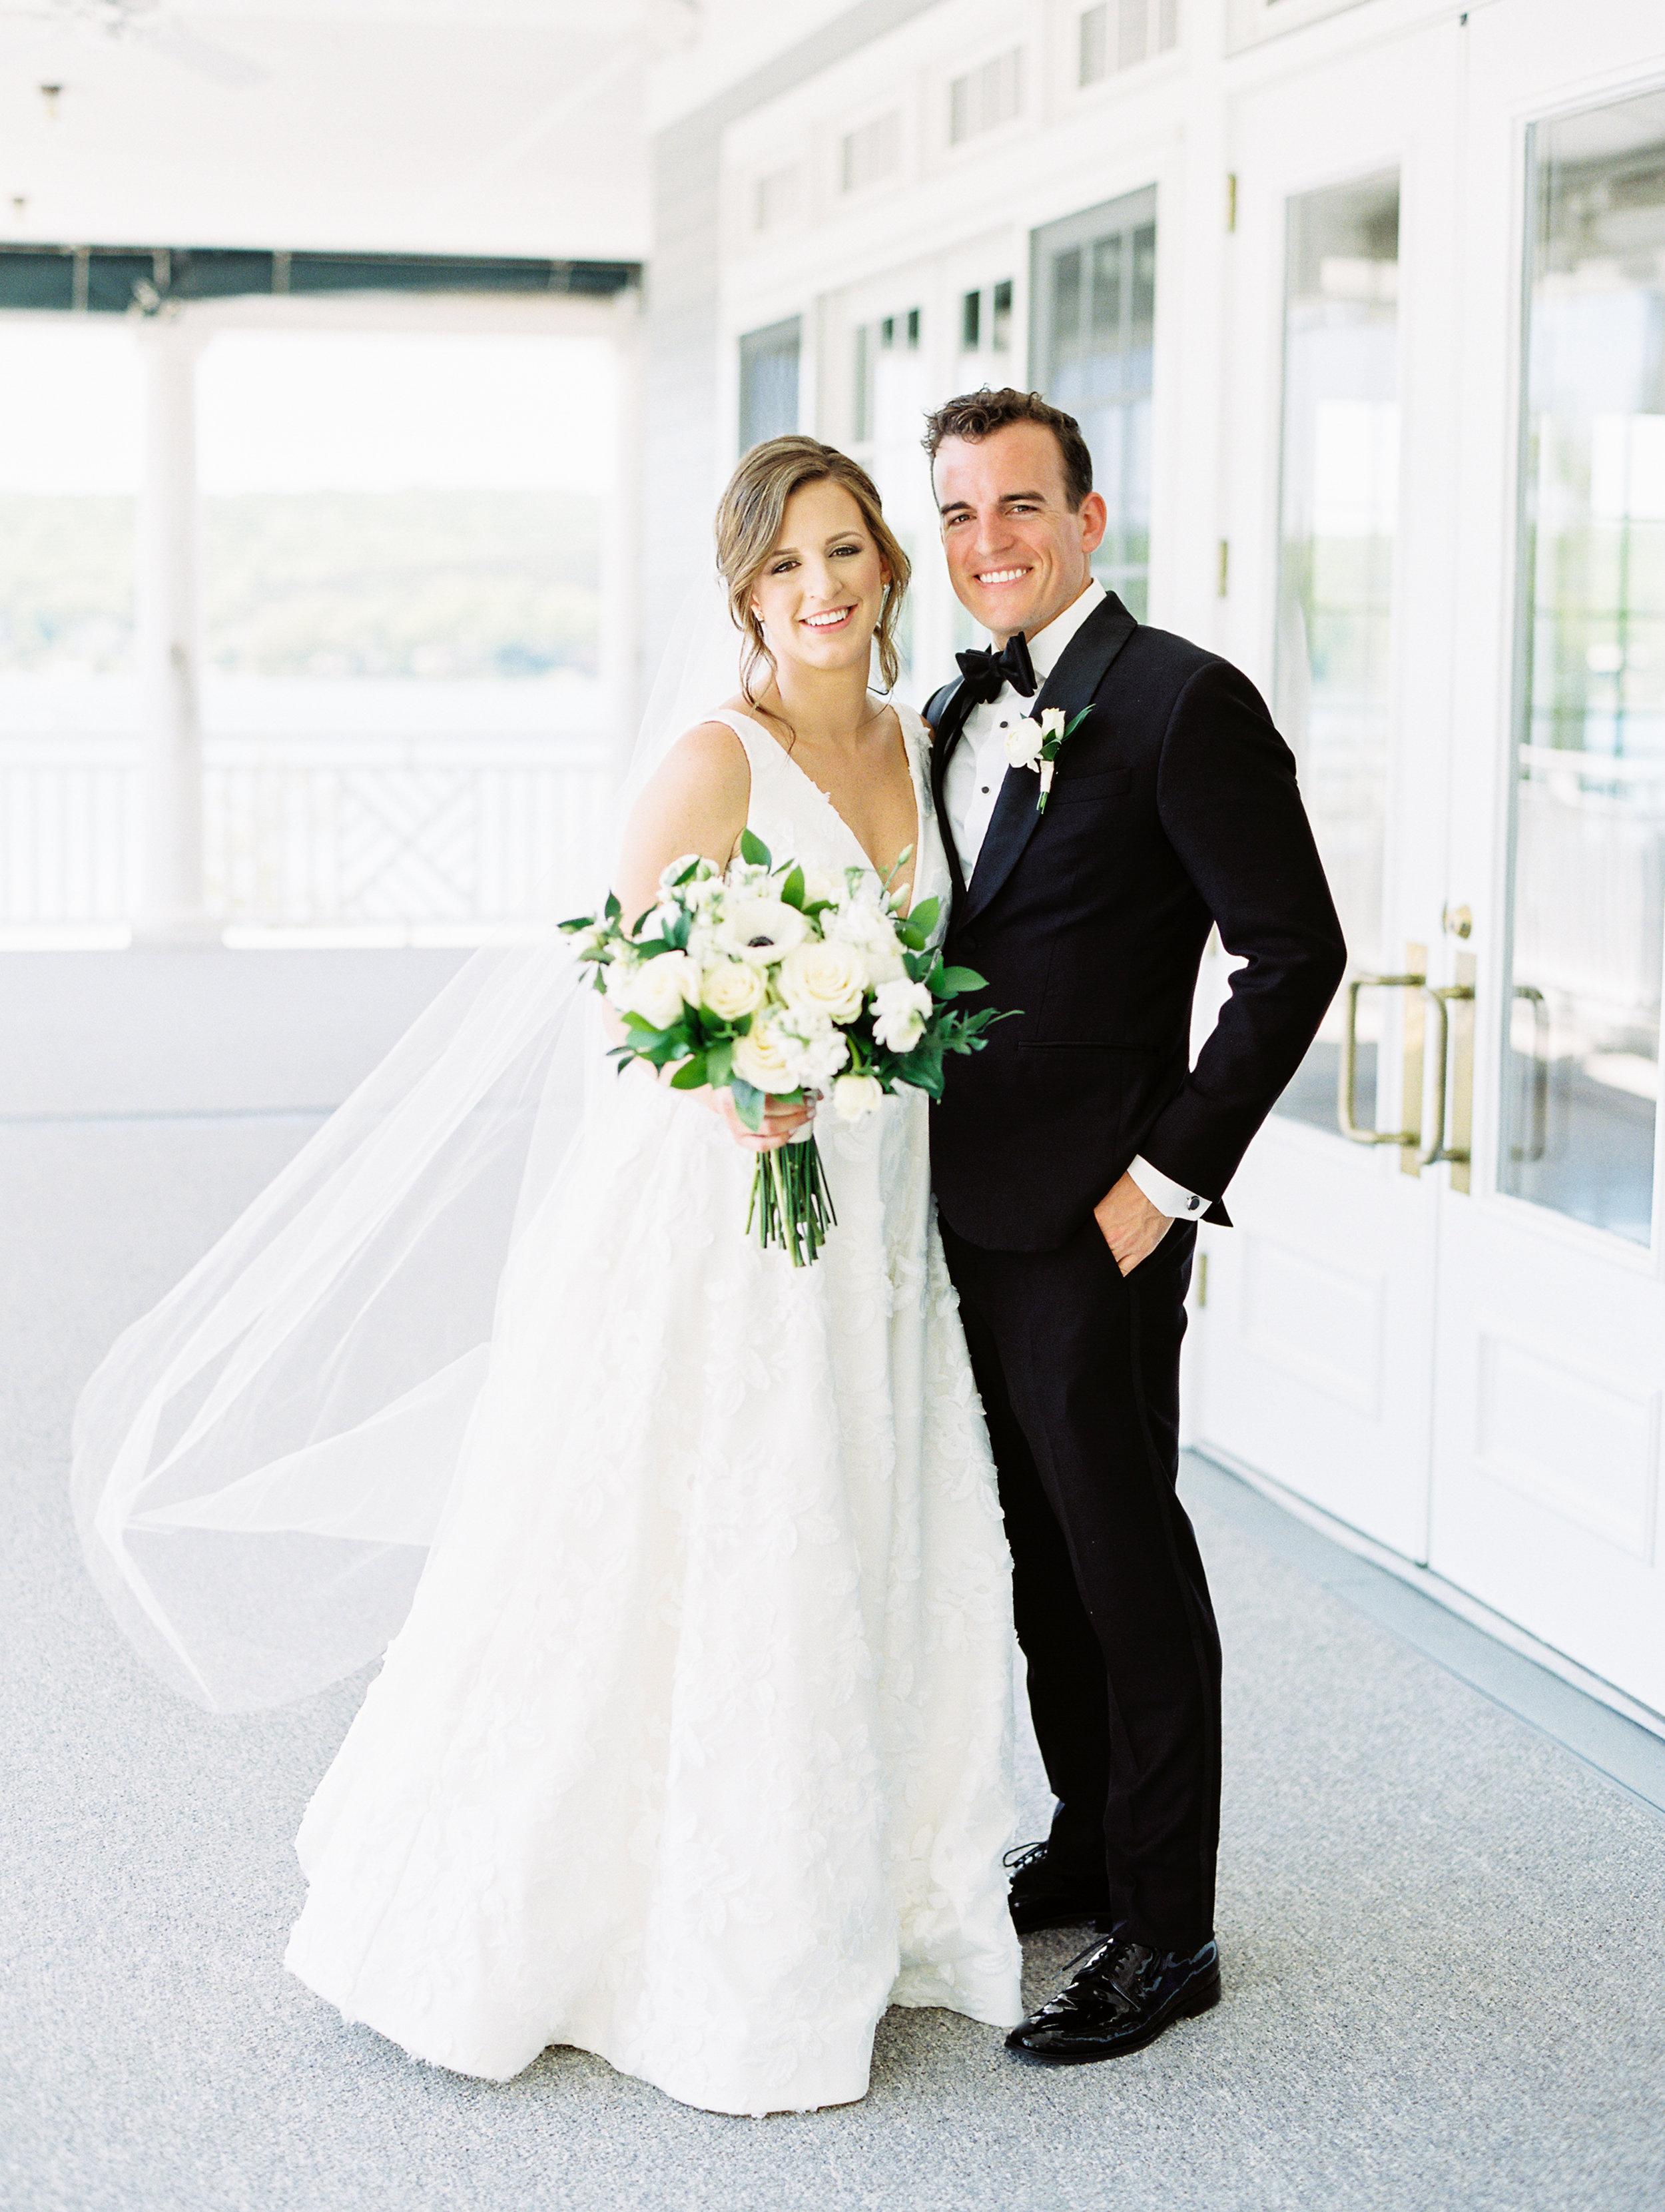 DeGuilio+Wedding+First+Lookf-7 copy.jpg